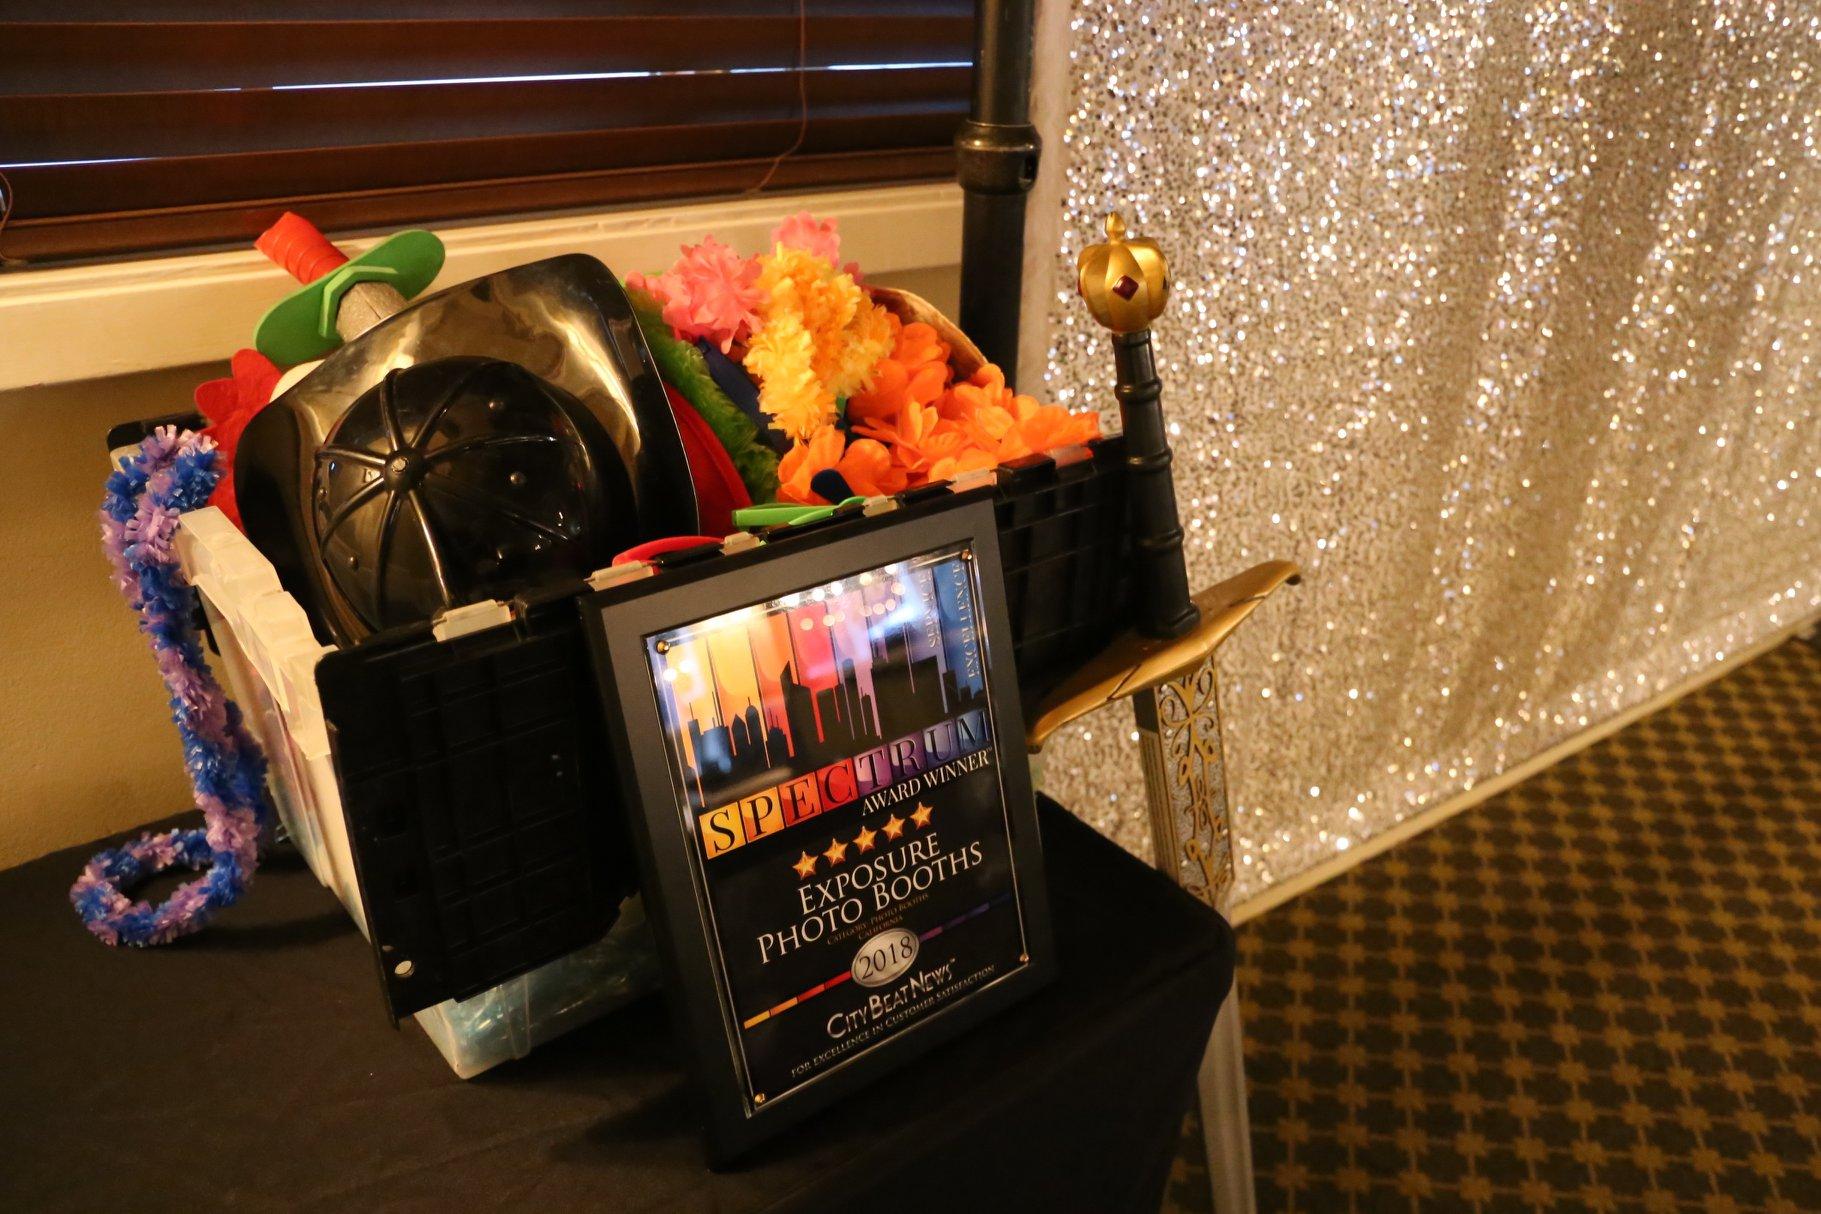 City Beat News, Spectrum Award Winner - Exposure Photo Booths